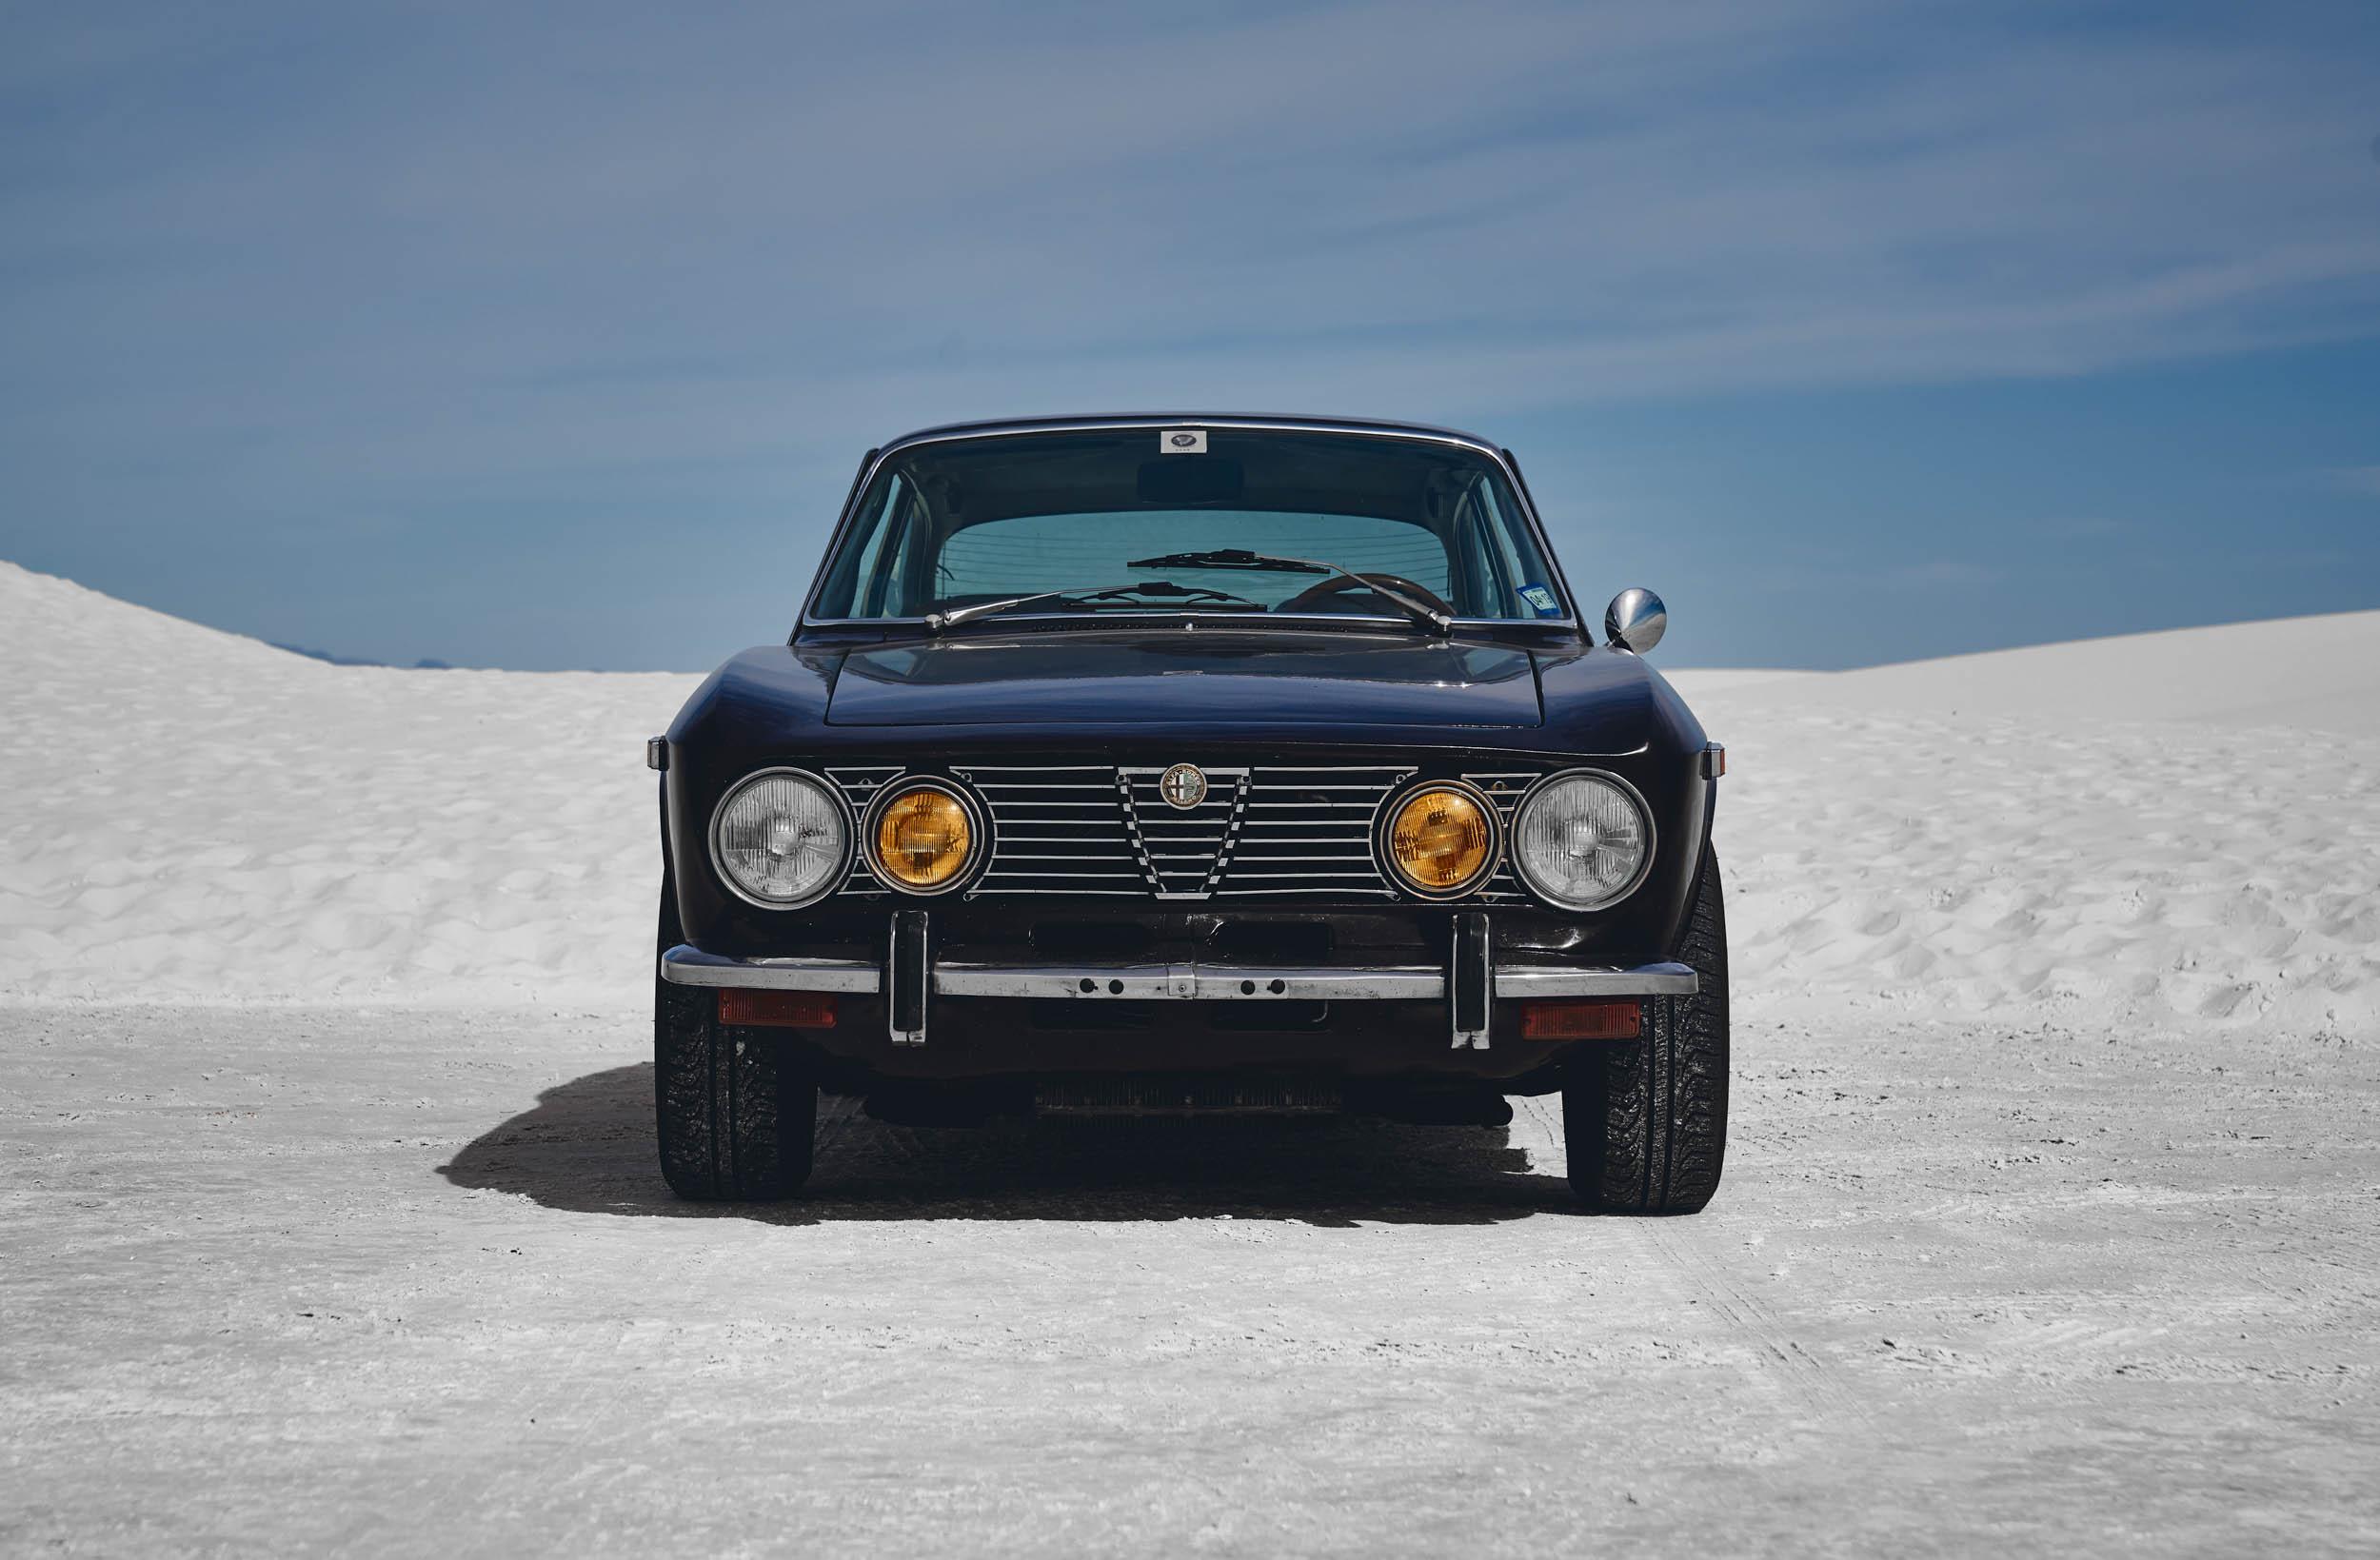 Alfa Romeo GTV front in desert